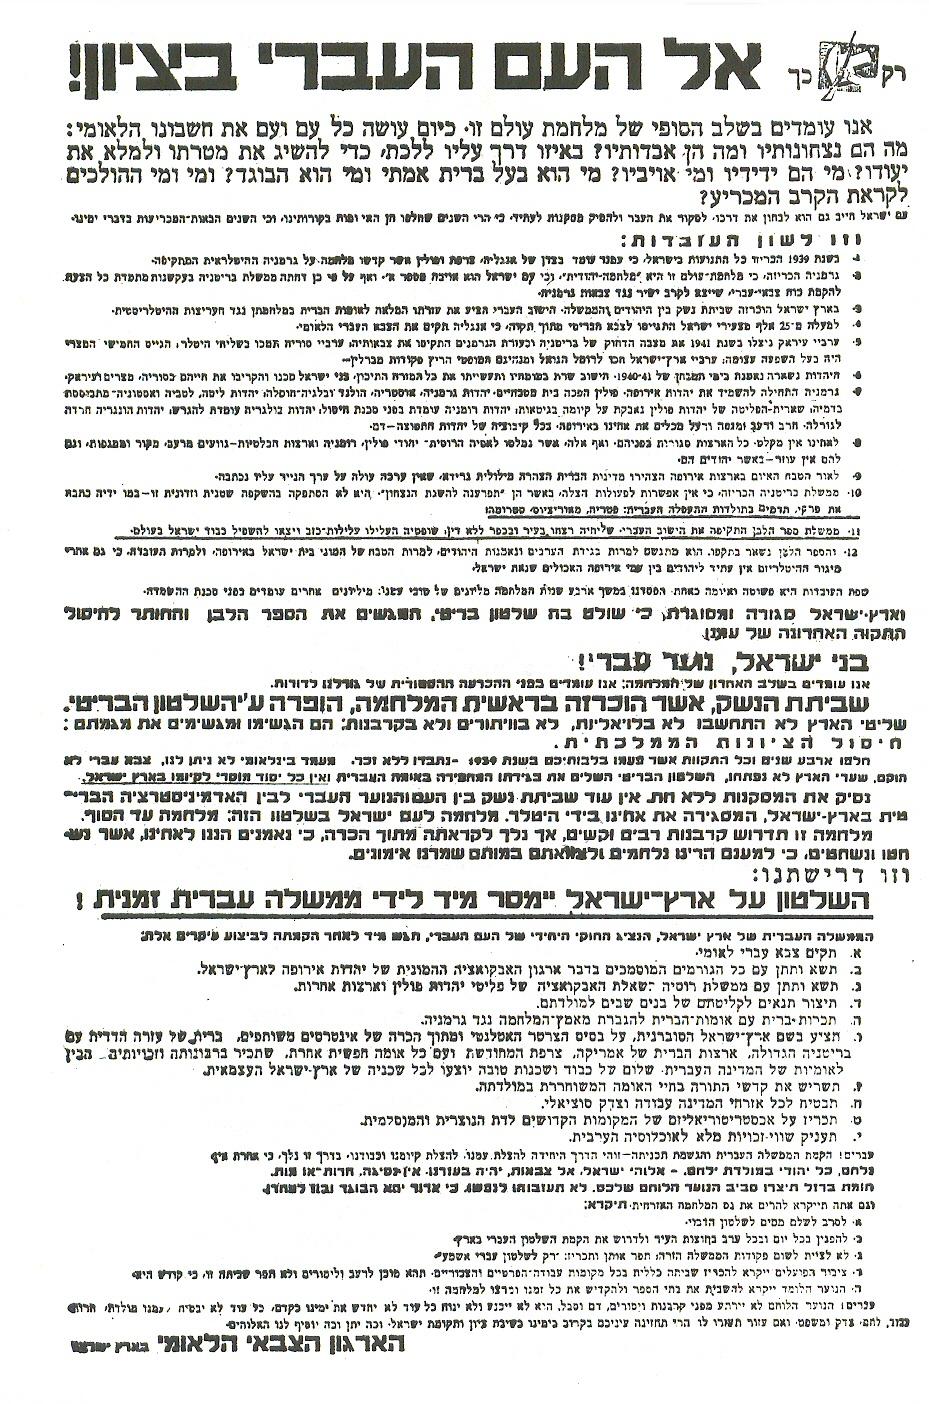 Talk:Jewish insurgency in Mandatory Palestine/Archive 1